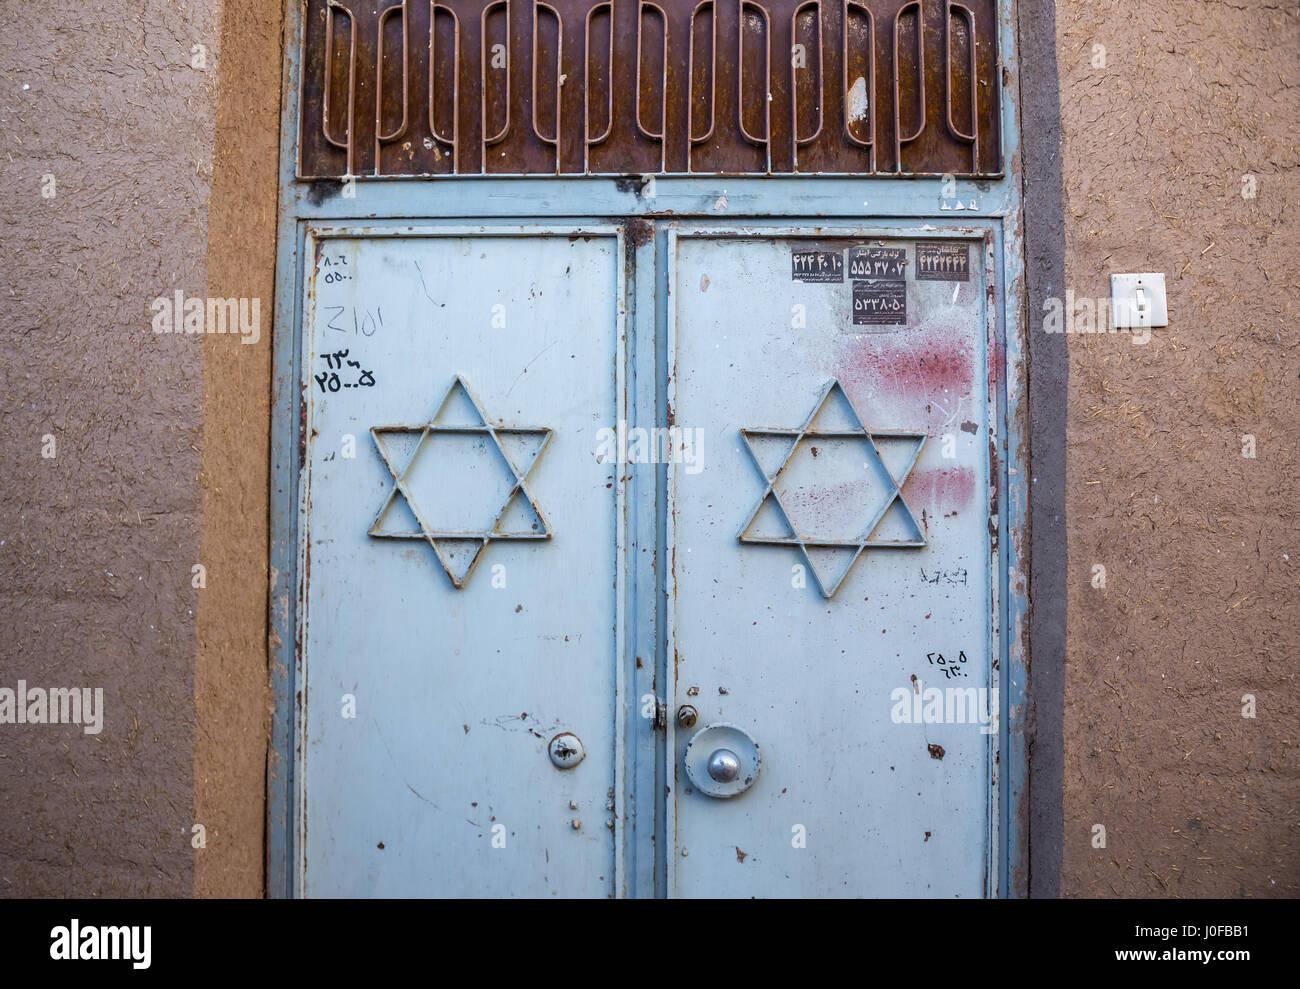 Jewish star of david symbol on a door on the old town of kashan city jewish star of david symbol on a door on the old town of kashan city capital of kashan county of iran buycottarizona Images